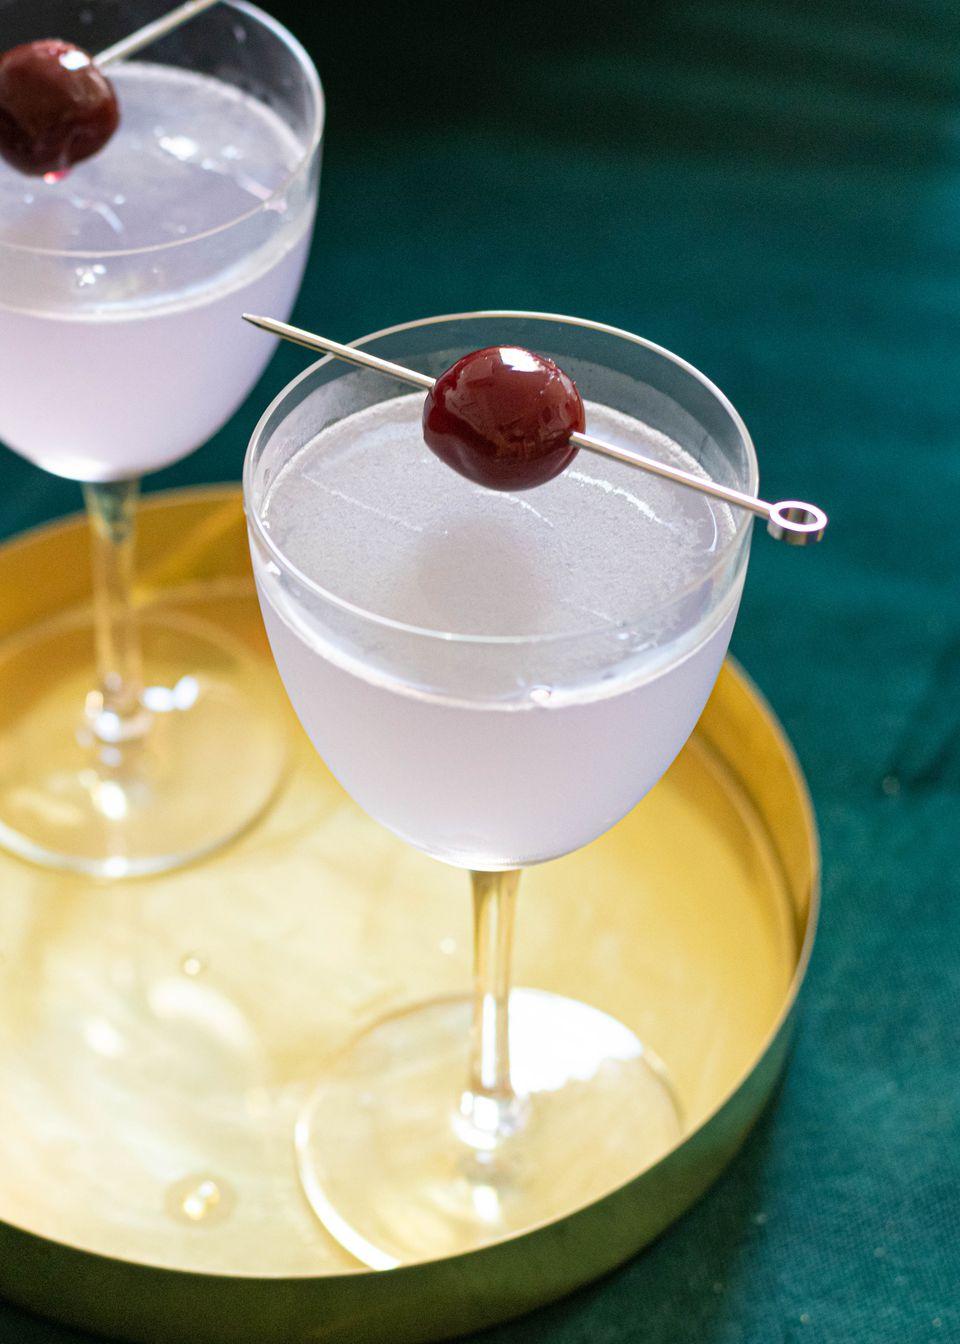 Aviation gin cocktail with cherry garnish